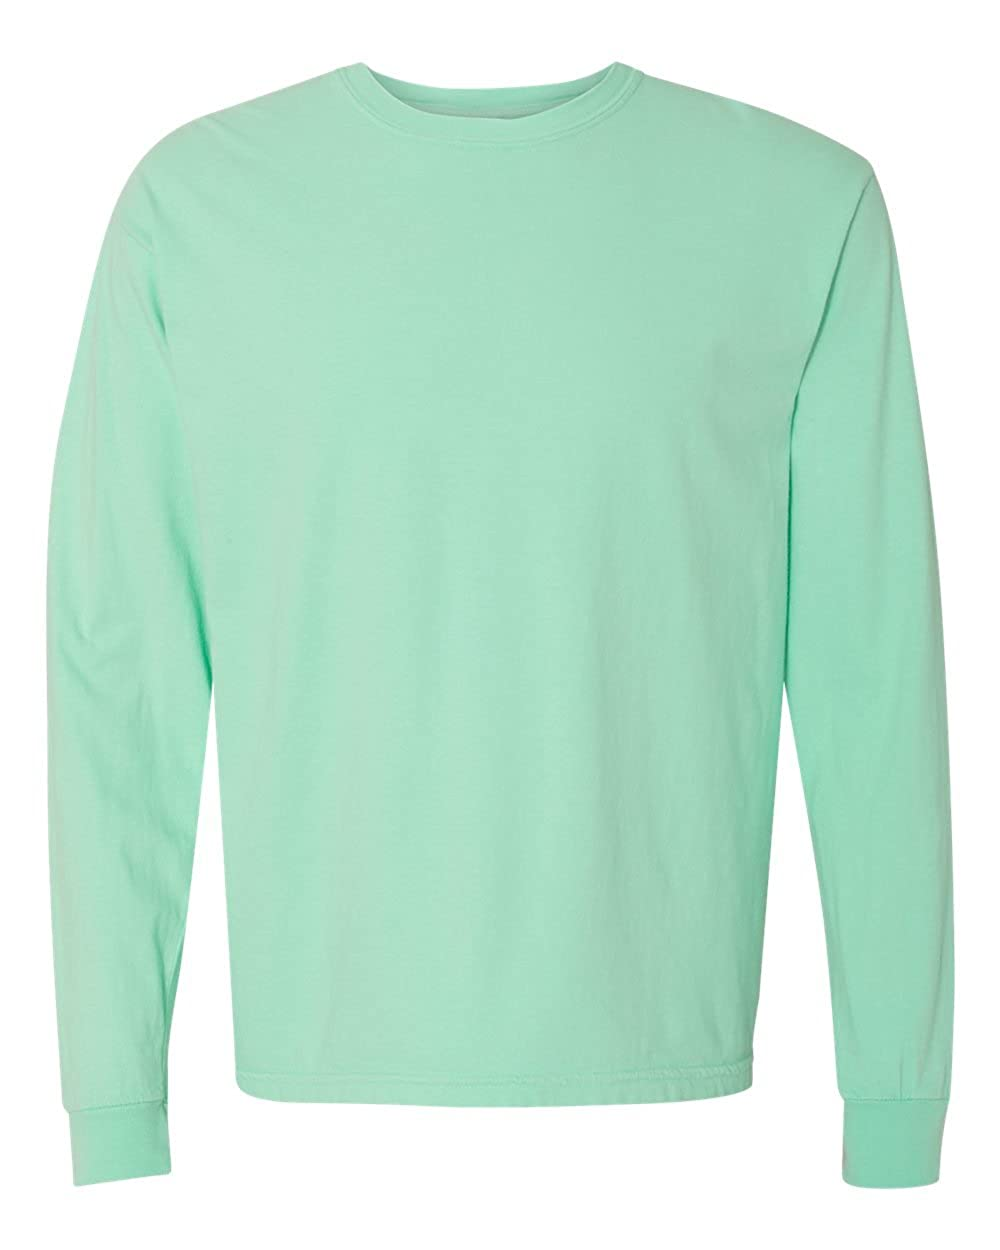 Comfort Colors Chouinard 6014 Adult Heavyweight Long Sleeve Tee